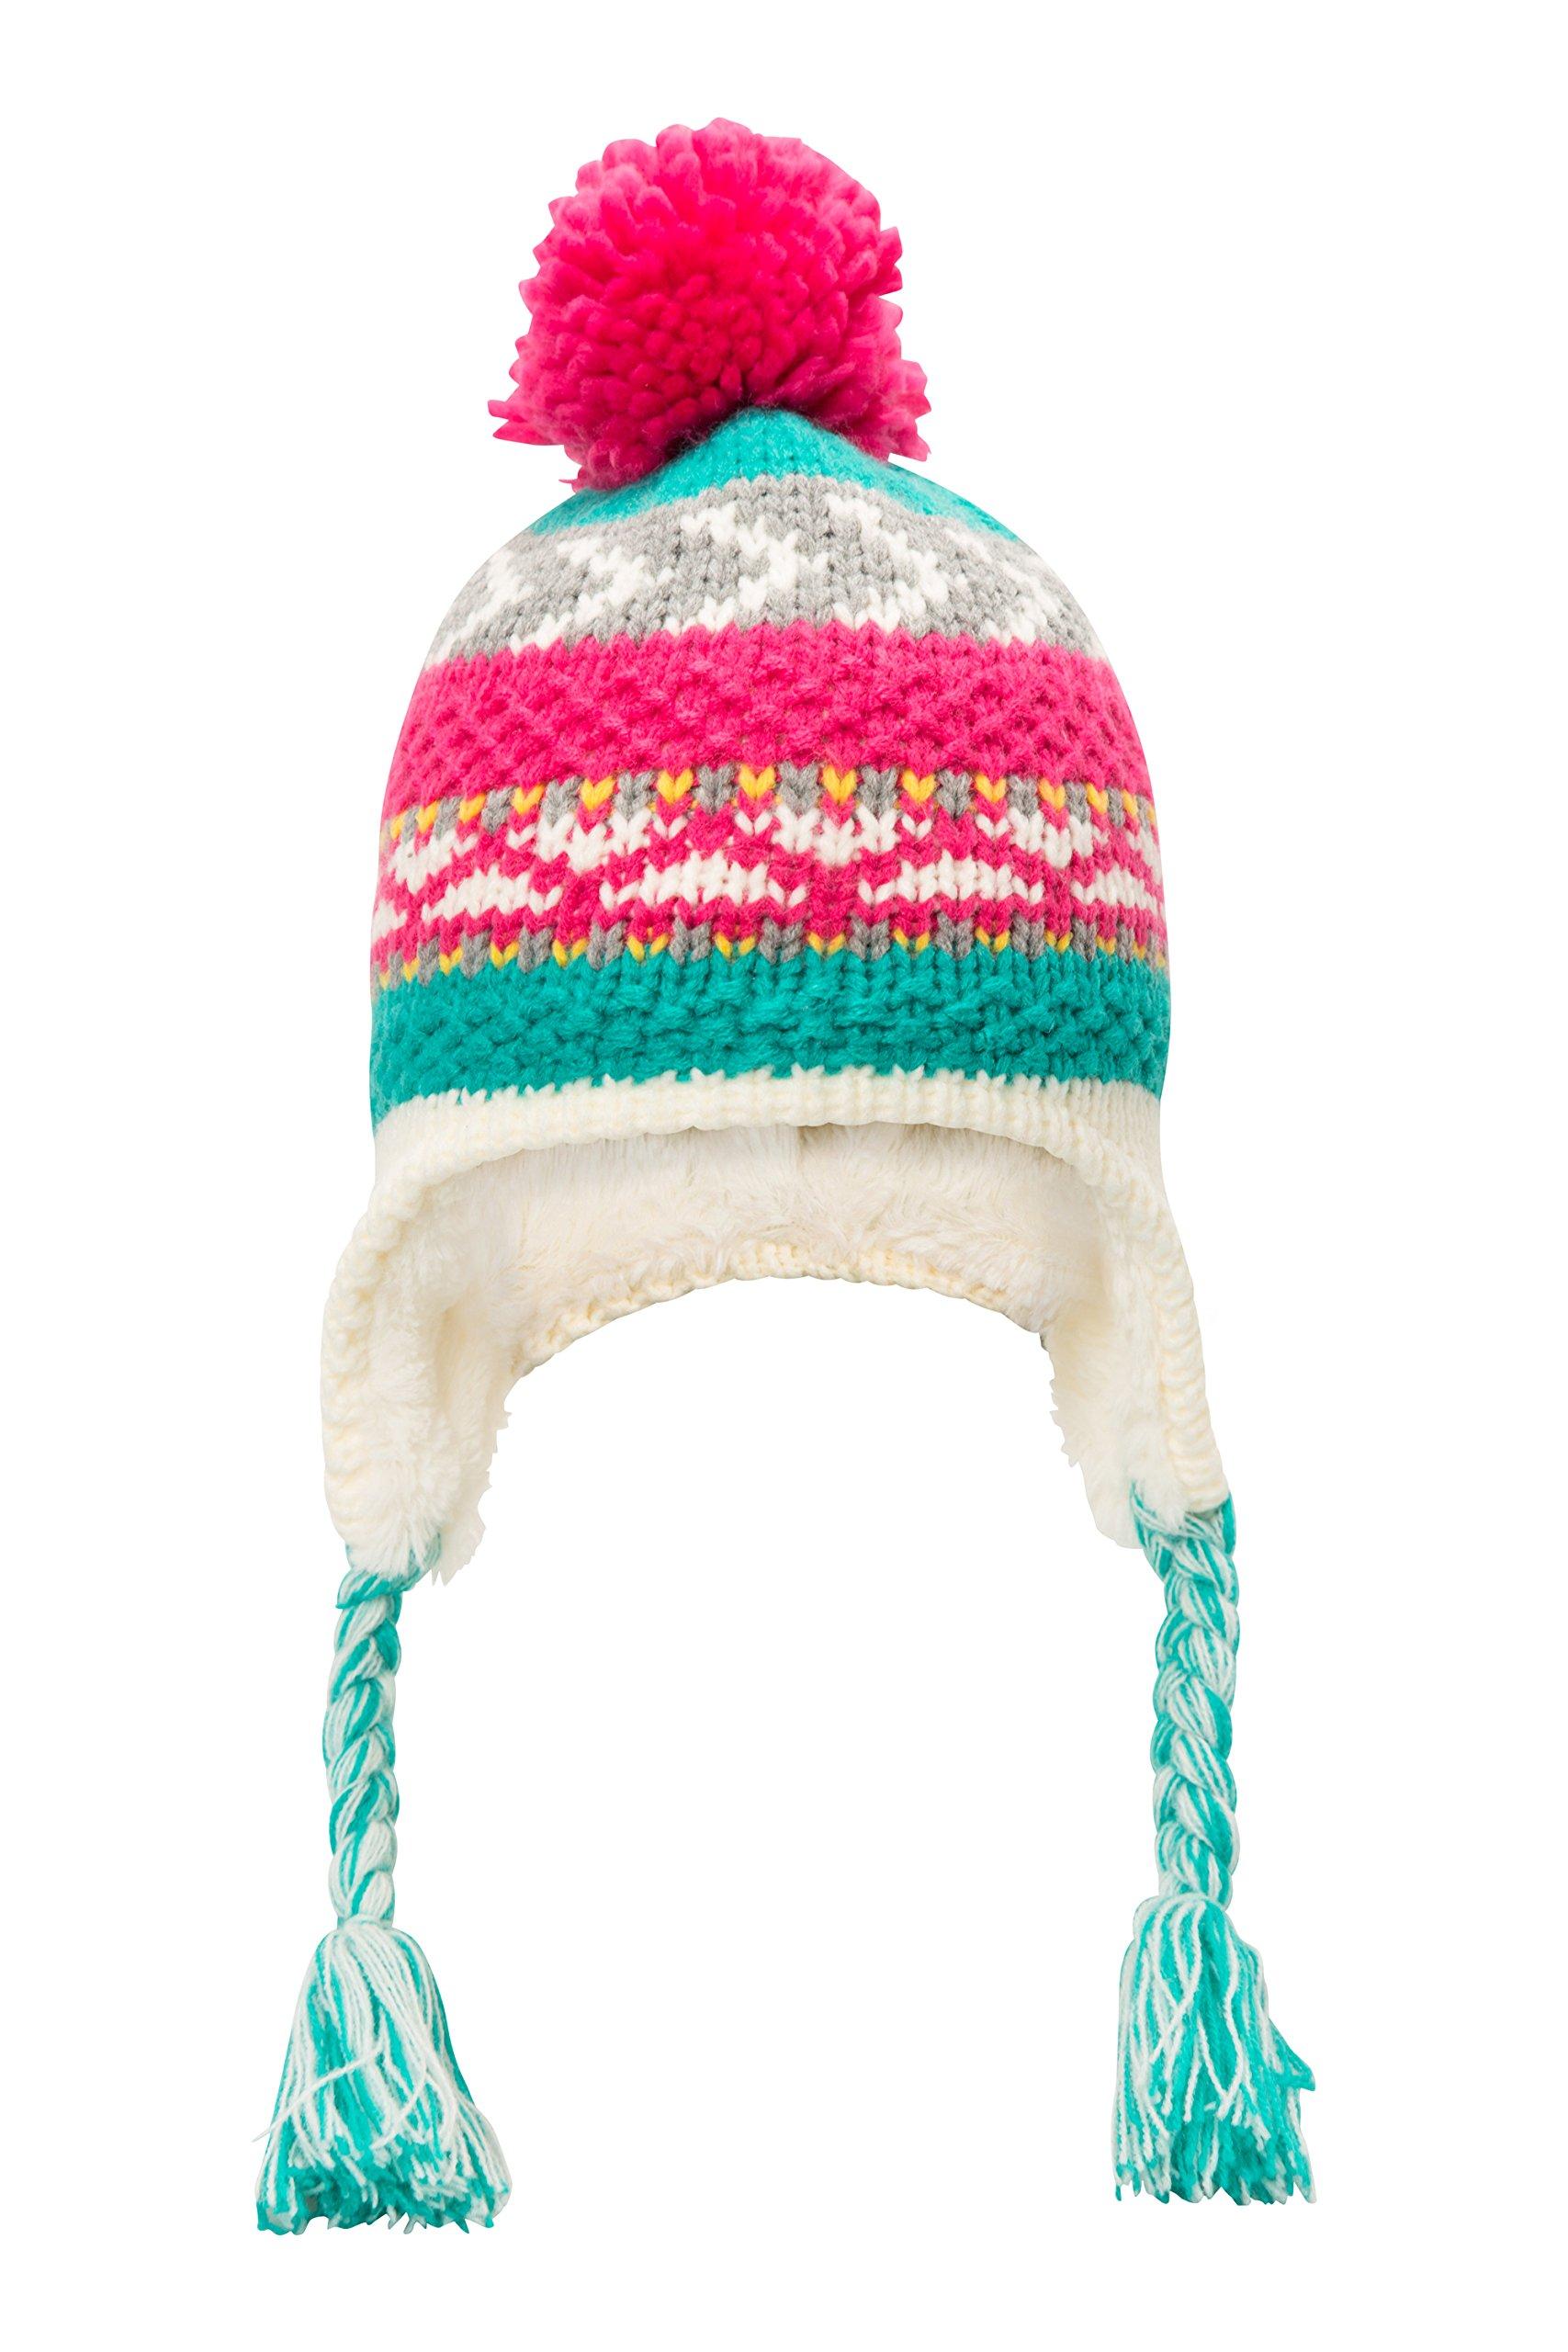 Mountain Warehouse Patterned Stripe Knit Kids Hat Pink